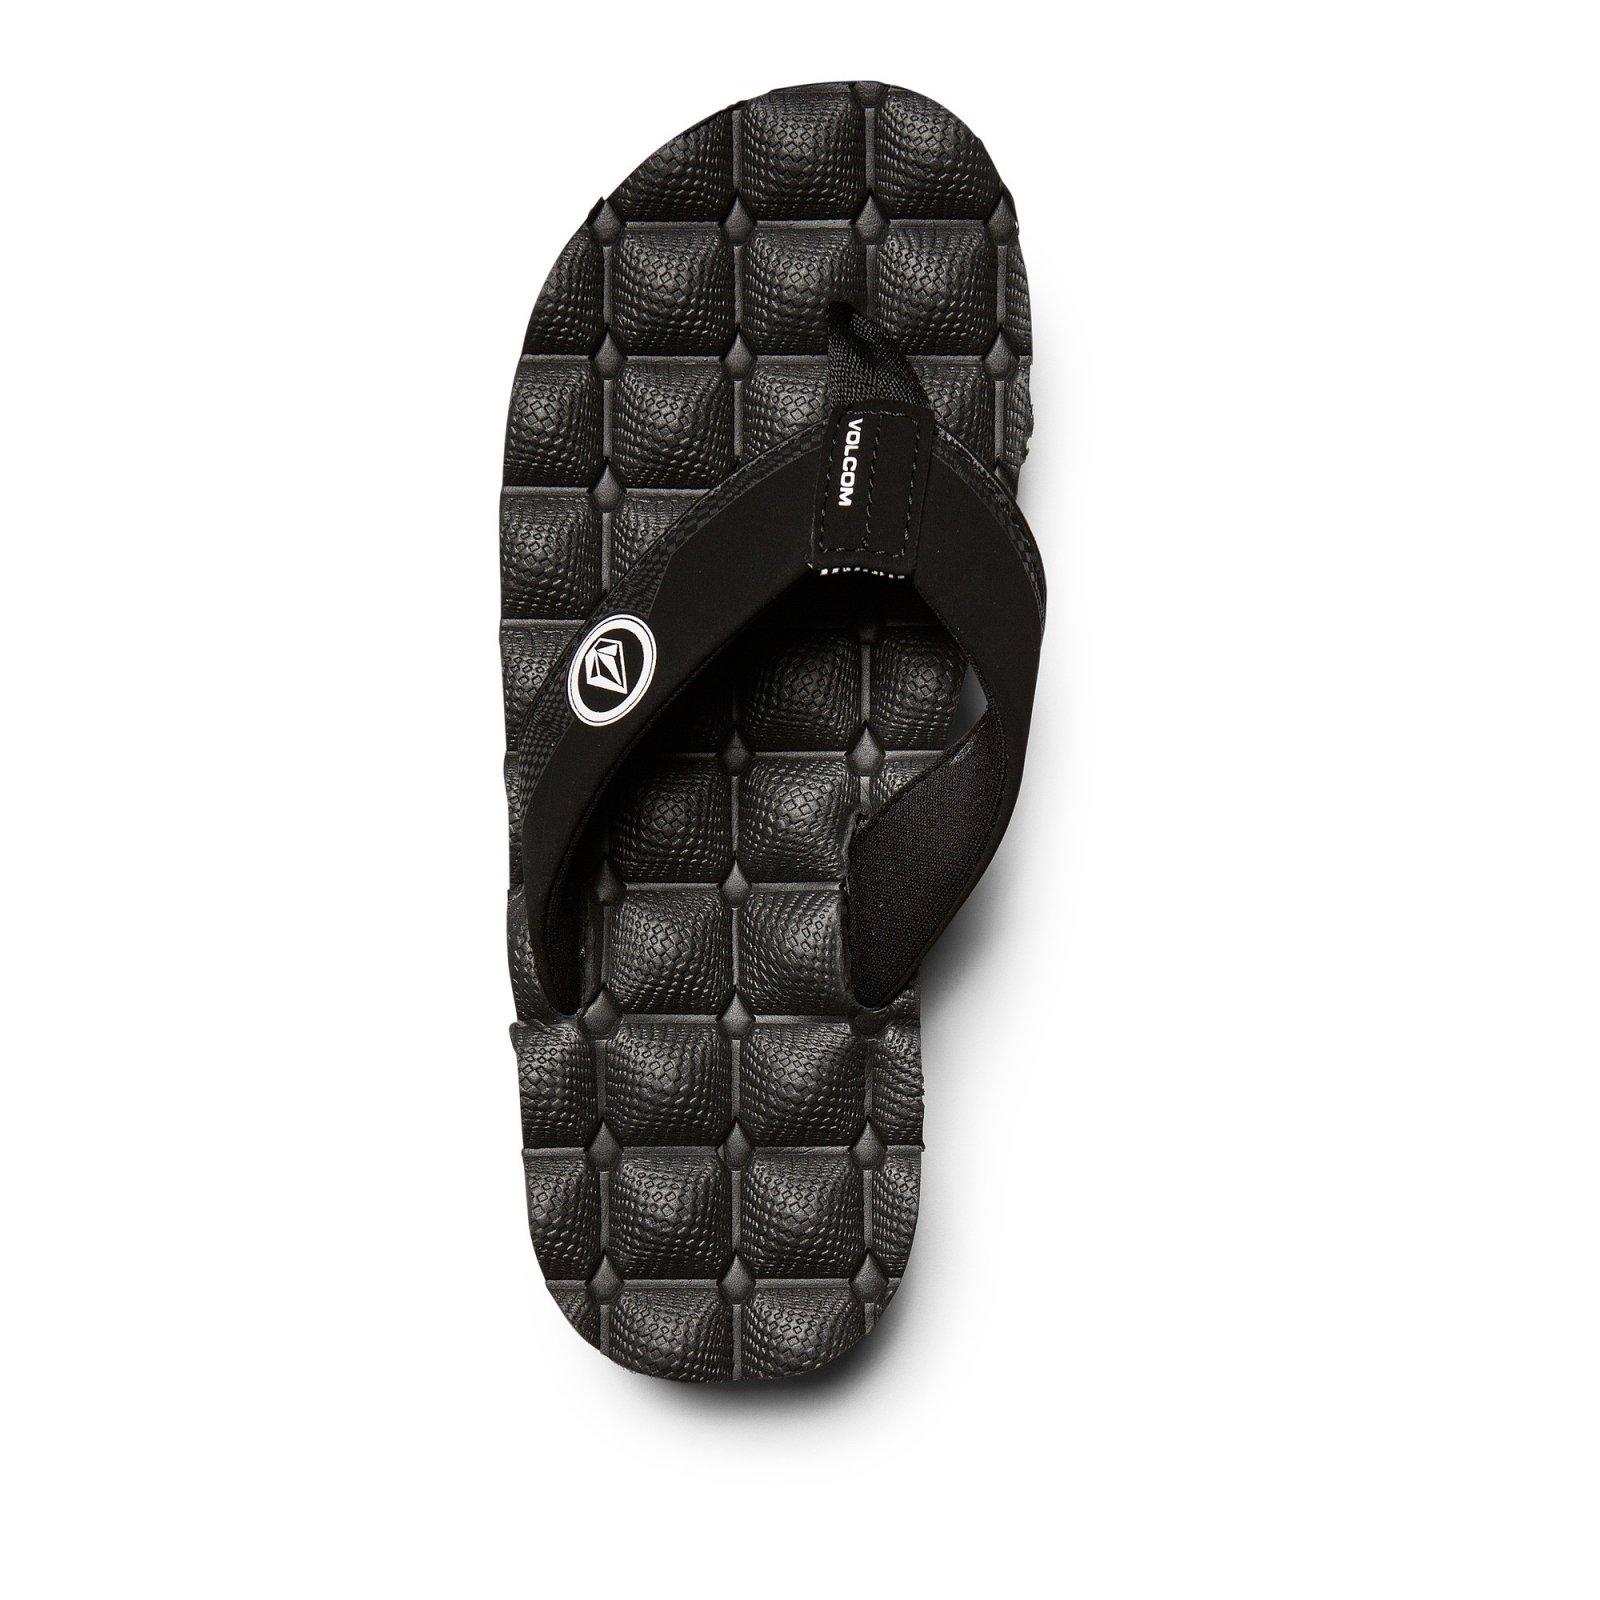 Volcom Recliner Big Youth Sandal Black White